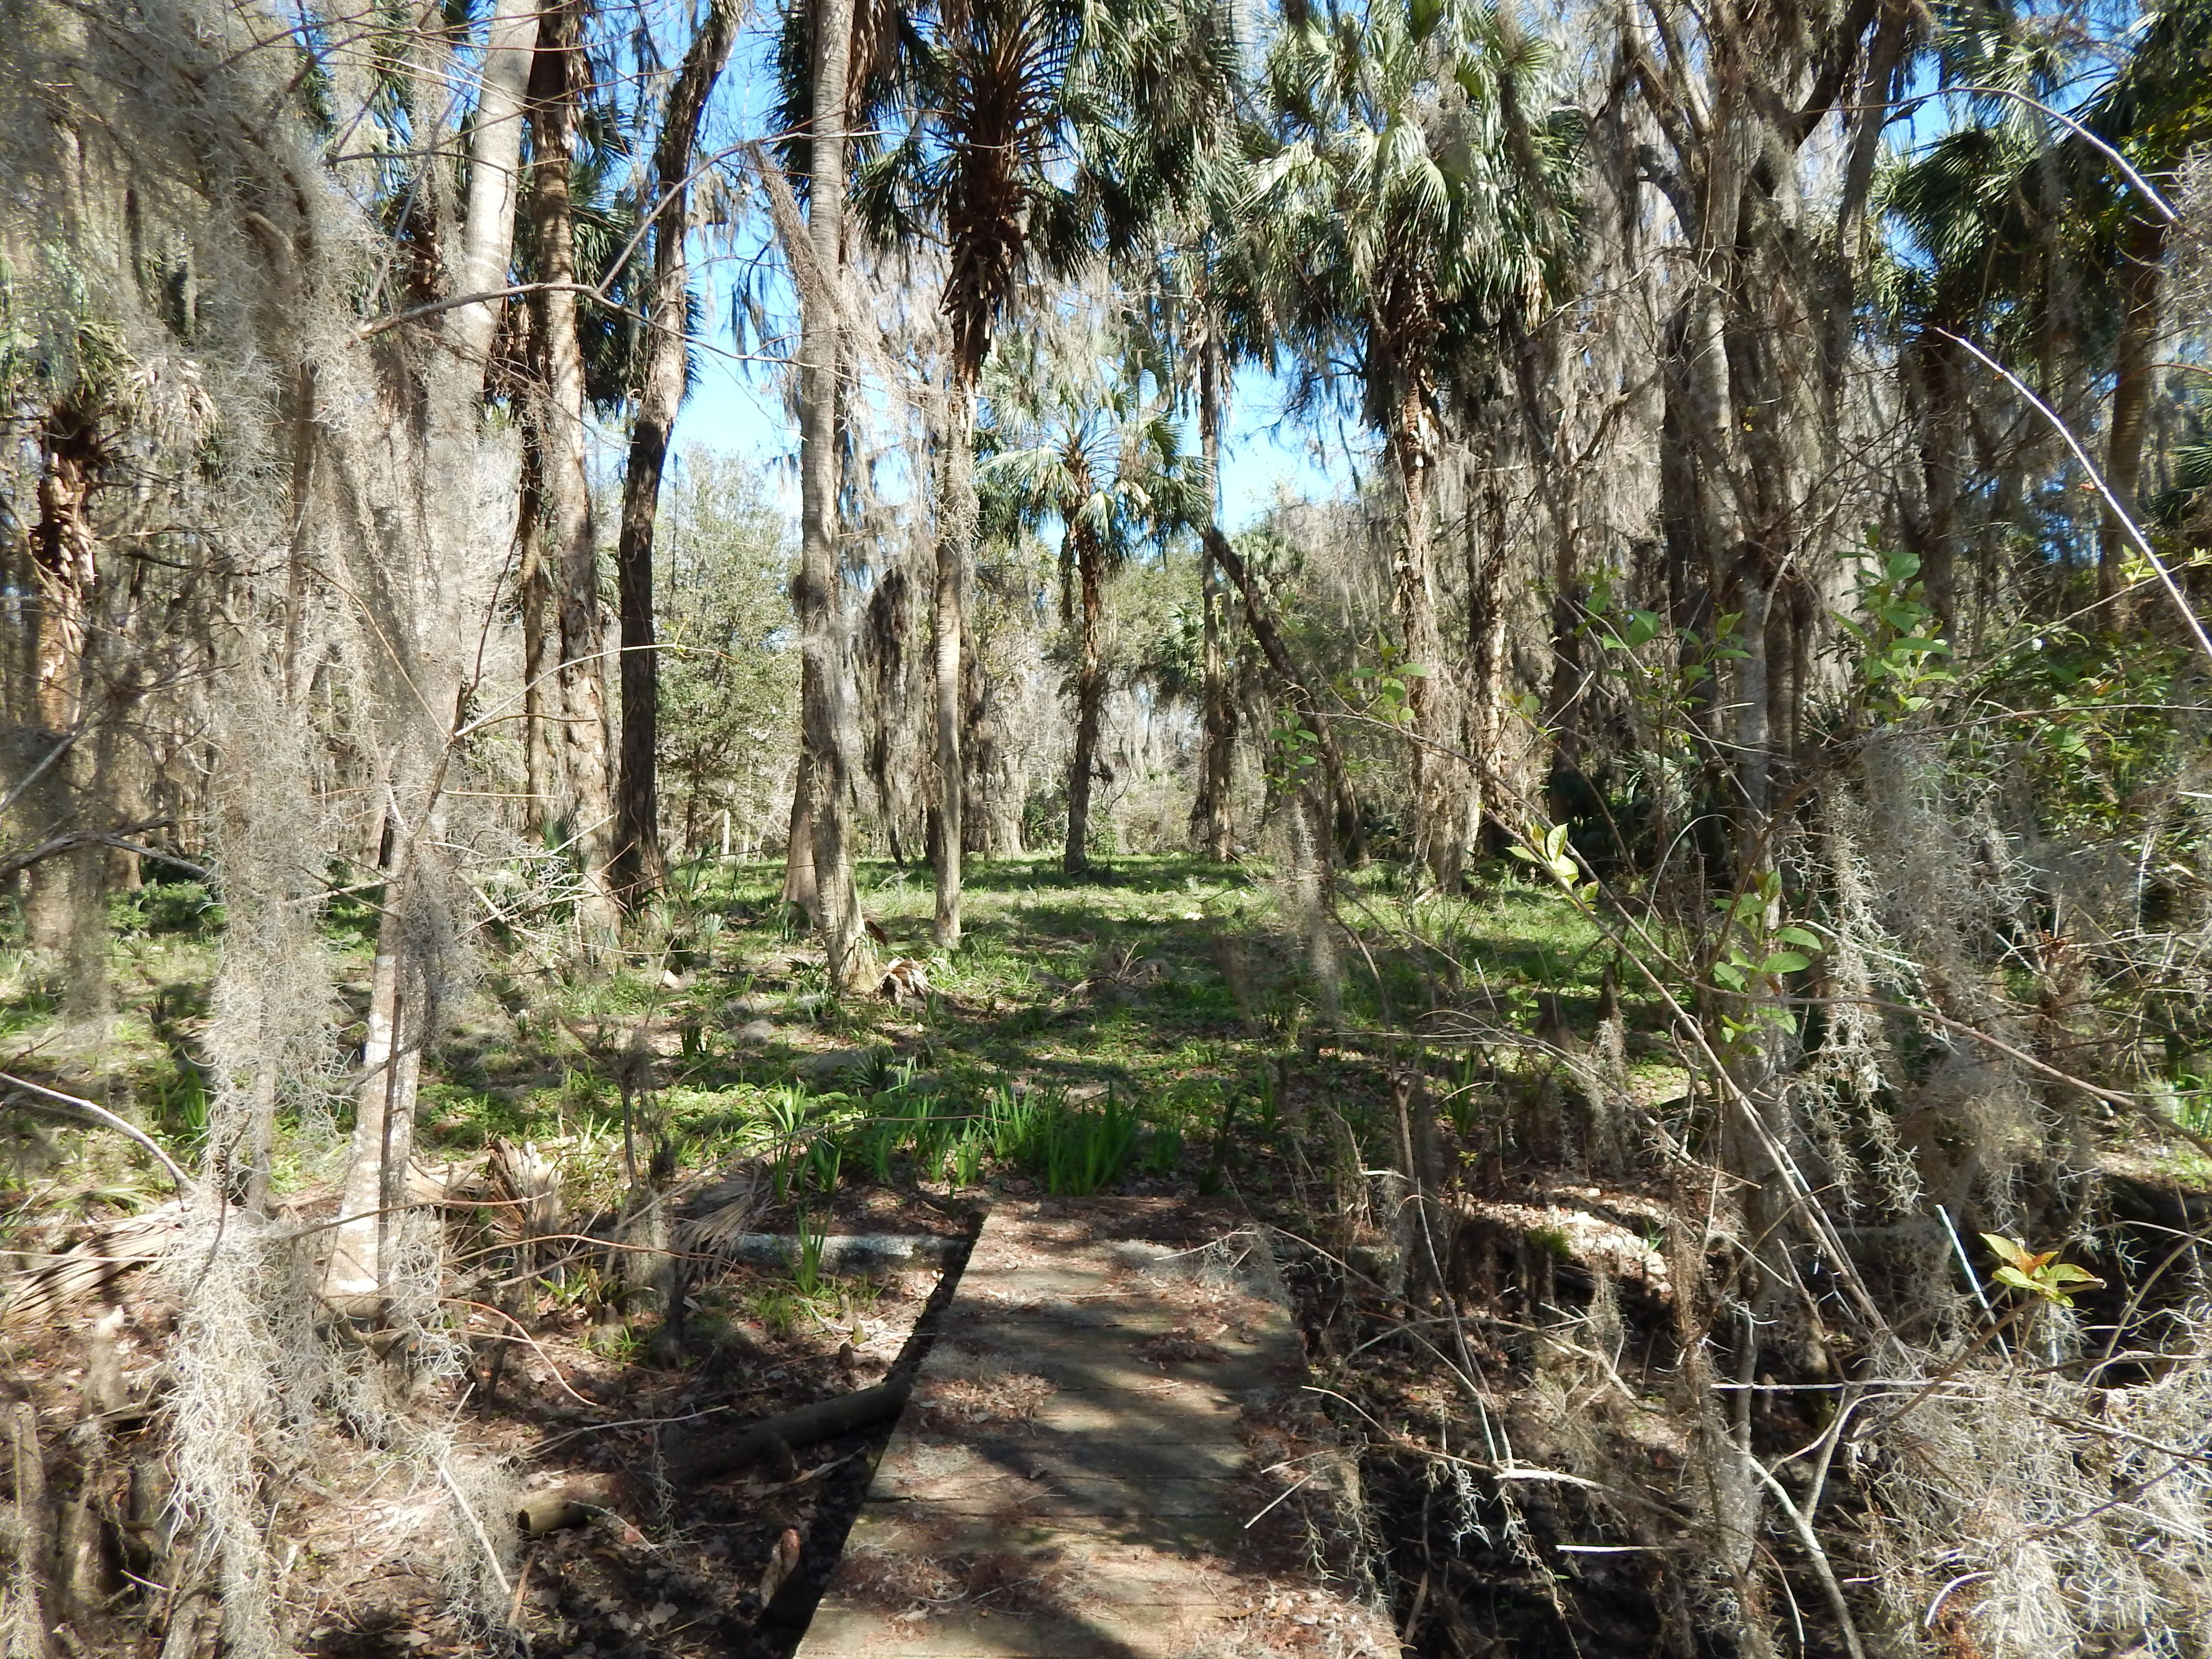 ccc66da3517ccc07951b98c245ac6da0 - Forest Lawn Memory Gardens Ocala Fl